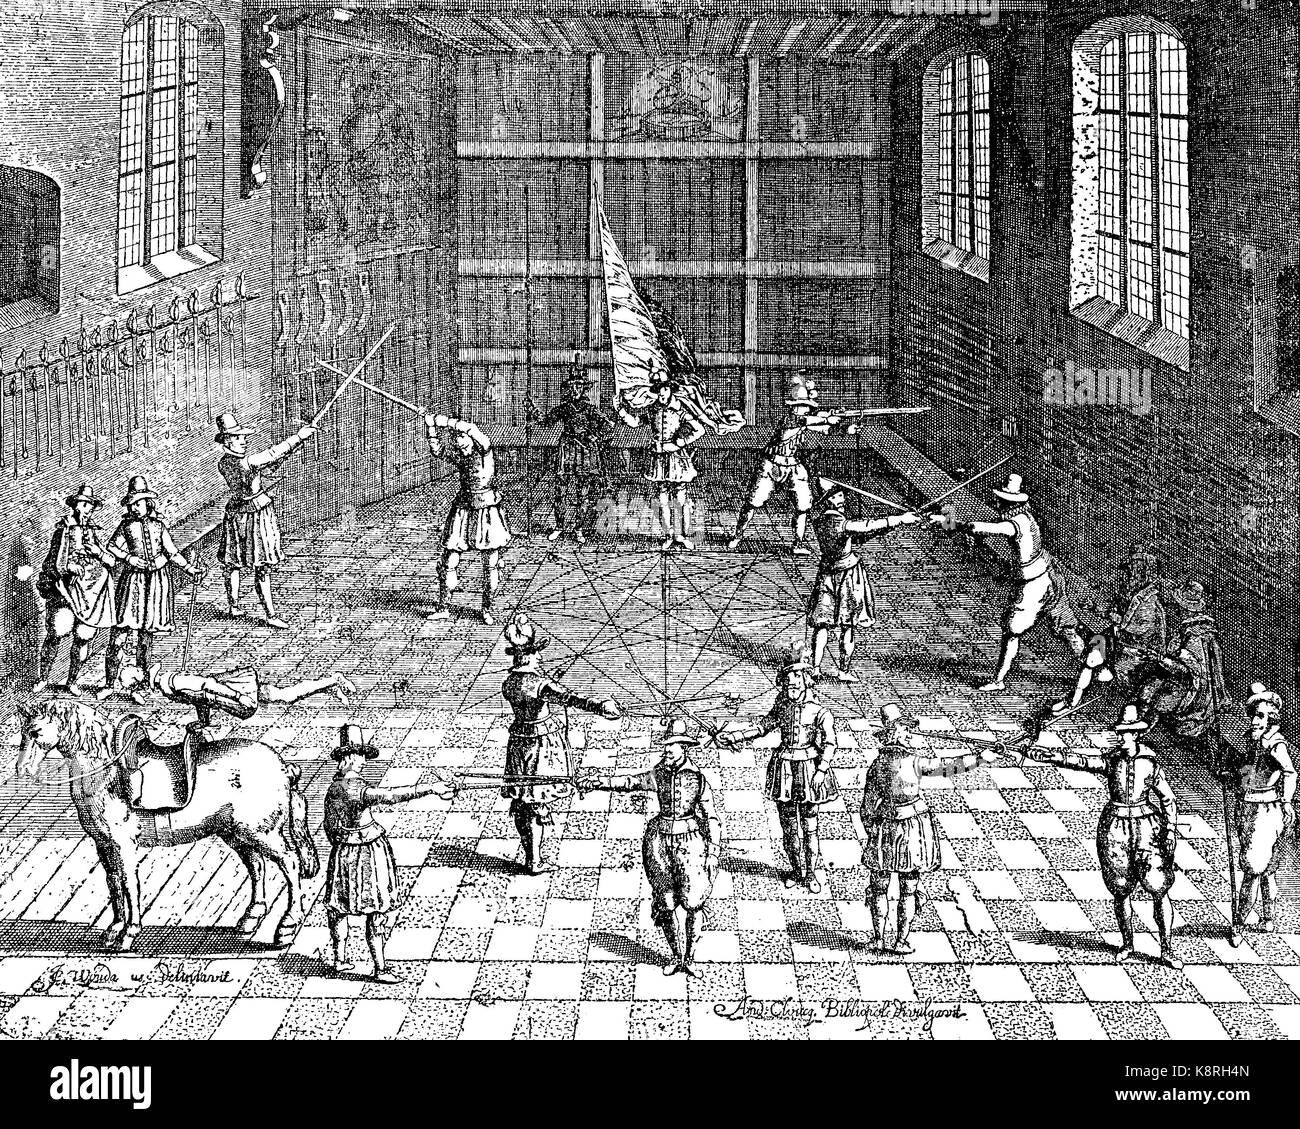 Students fencing, university of Leiden, Holland, Fechtübungen der Studenten in Leiden, 1610, digital improved - Stock Image